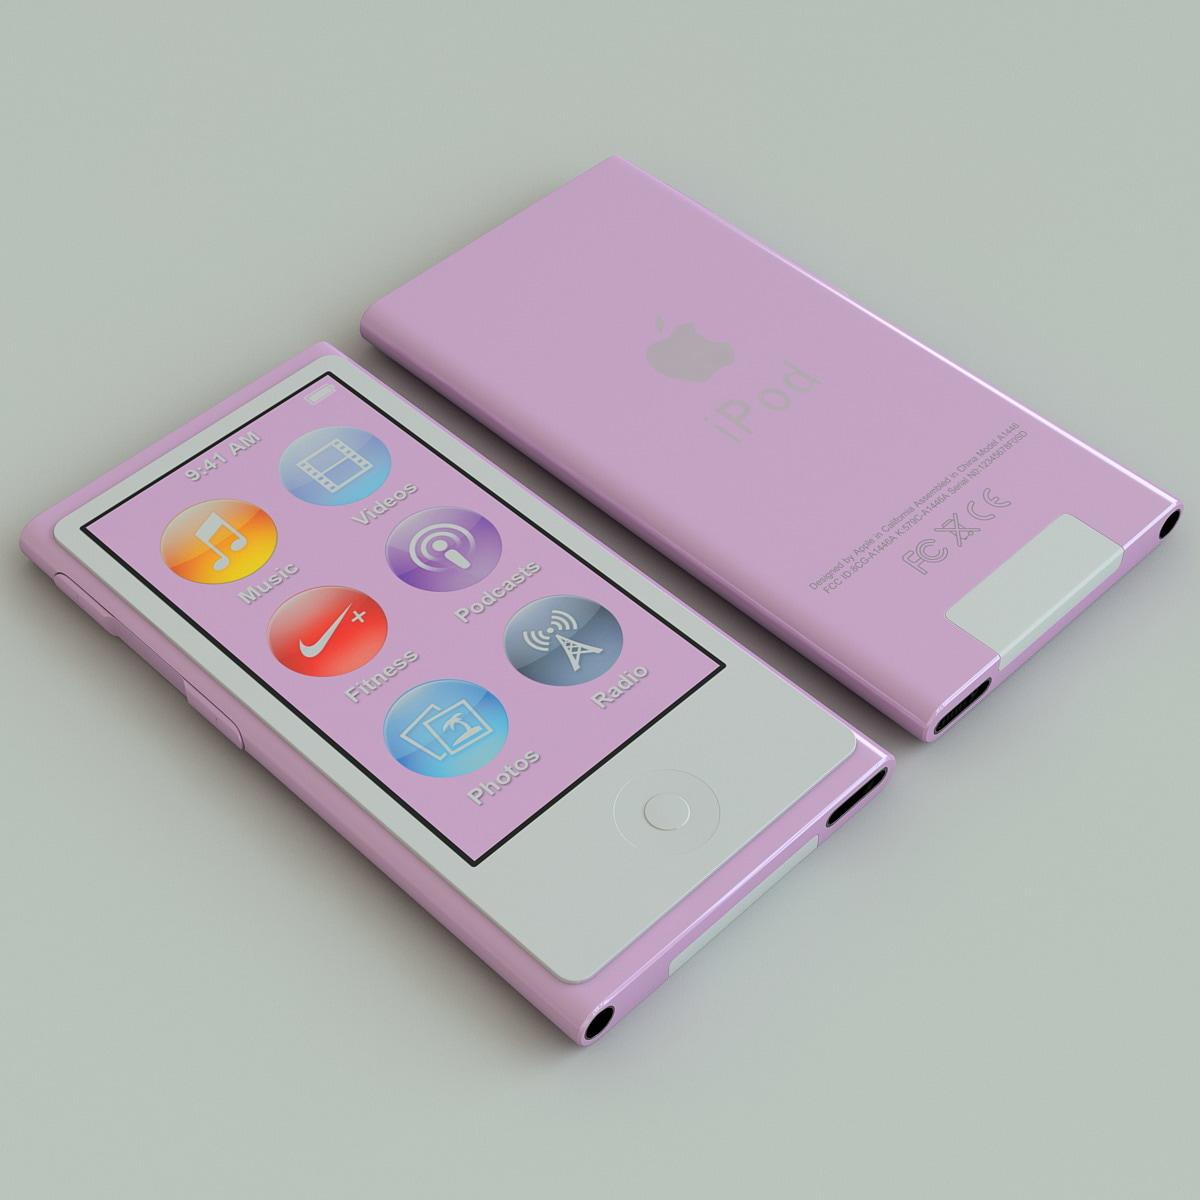 Ipod_Nano_Generation_7th_Pink_004.jpg